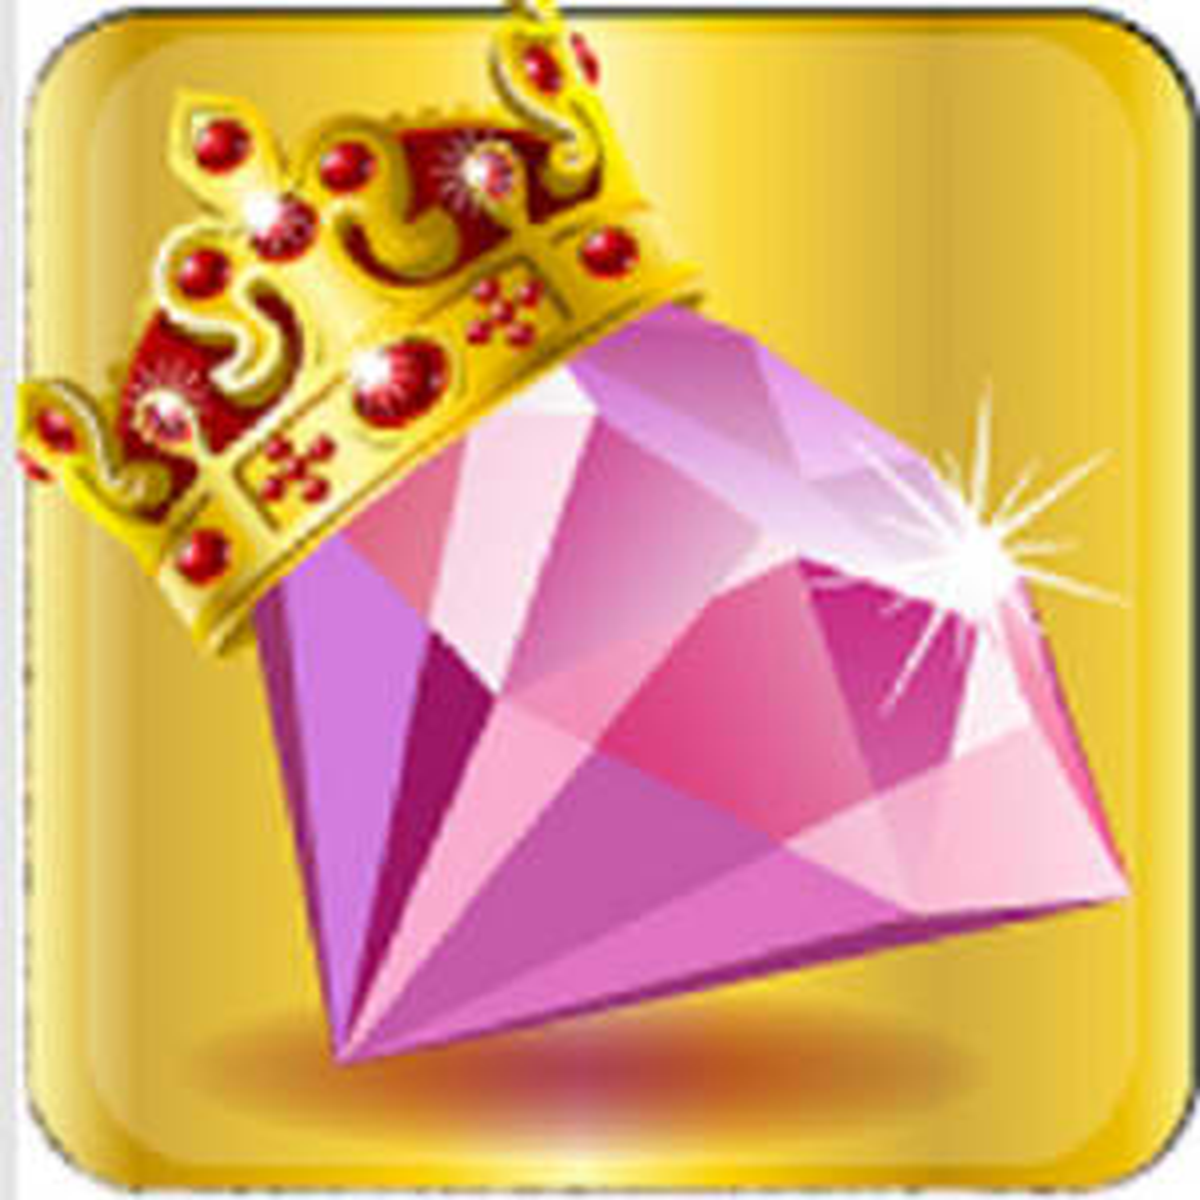 Joyas - joyas del rey jewels 1.0.3